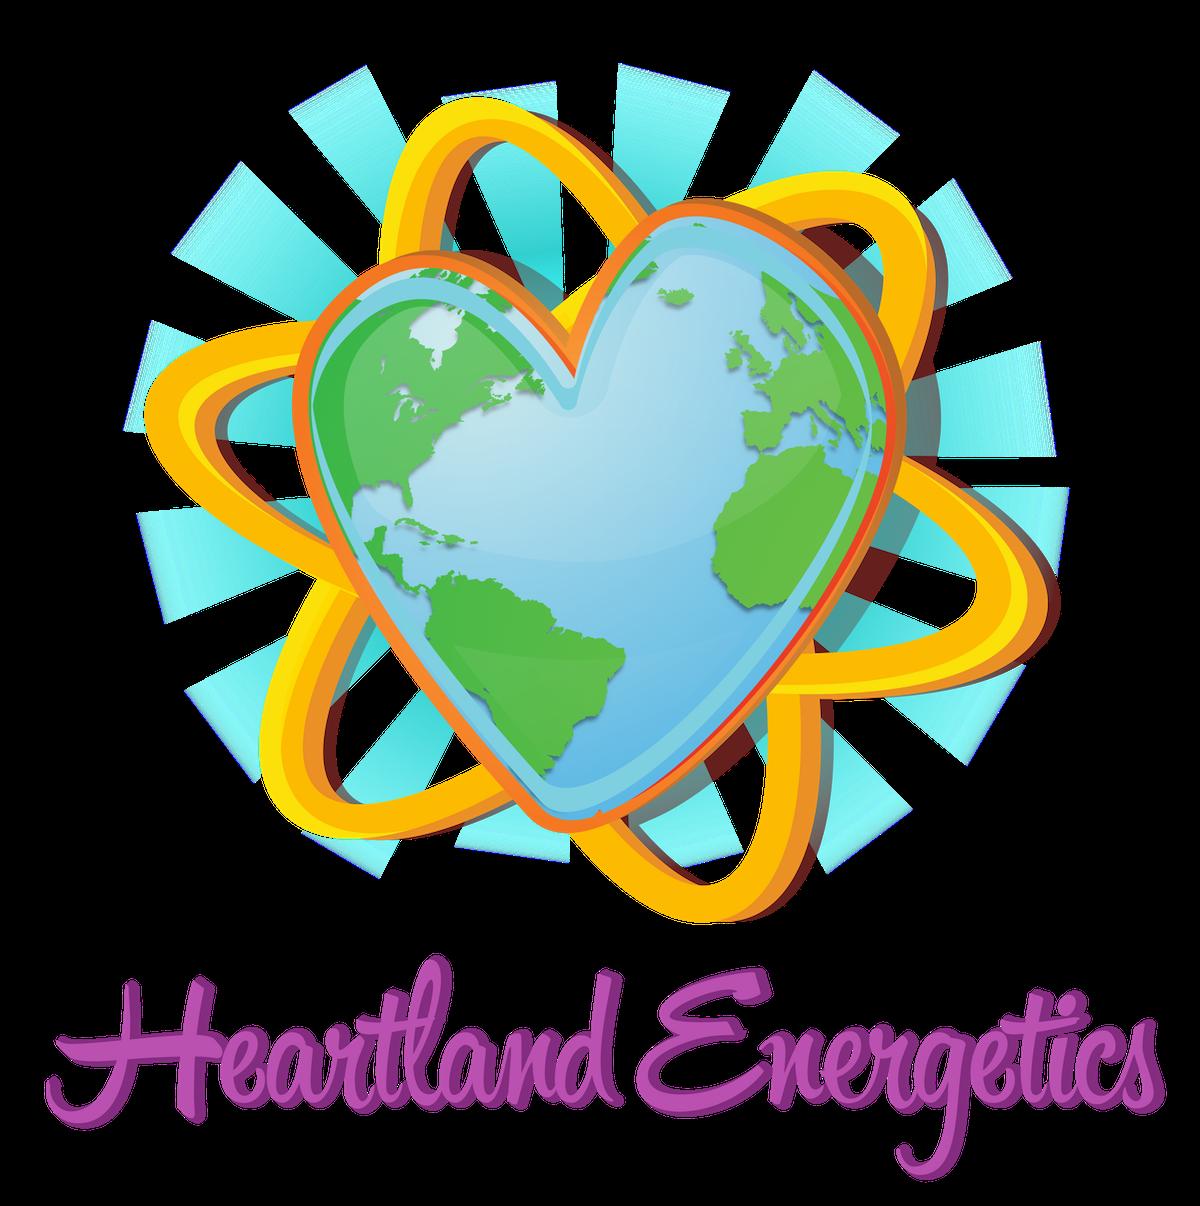 Heartland Energetics logo